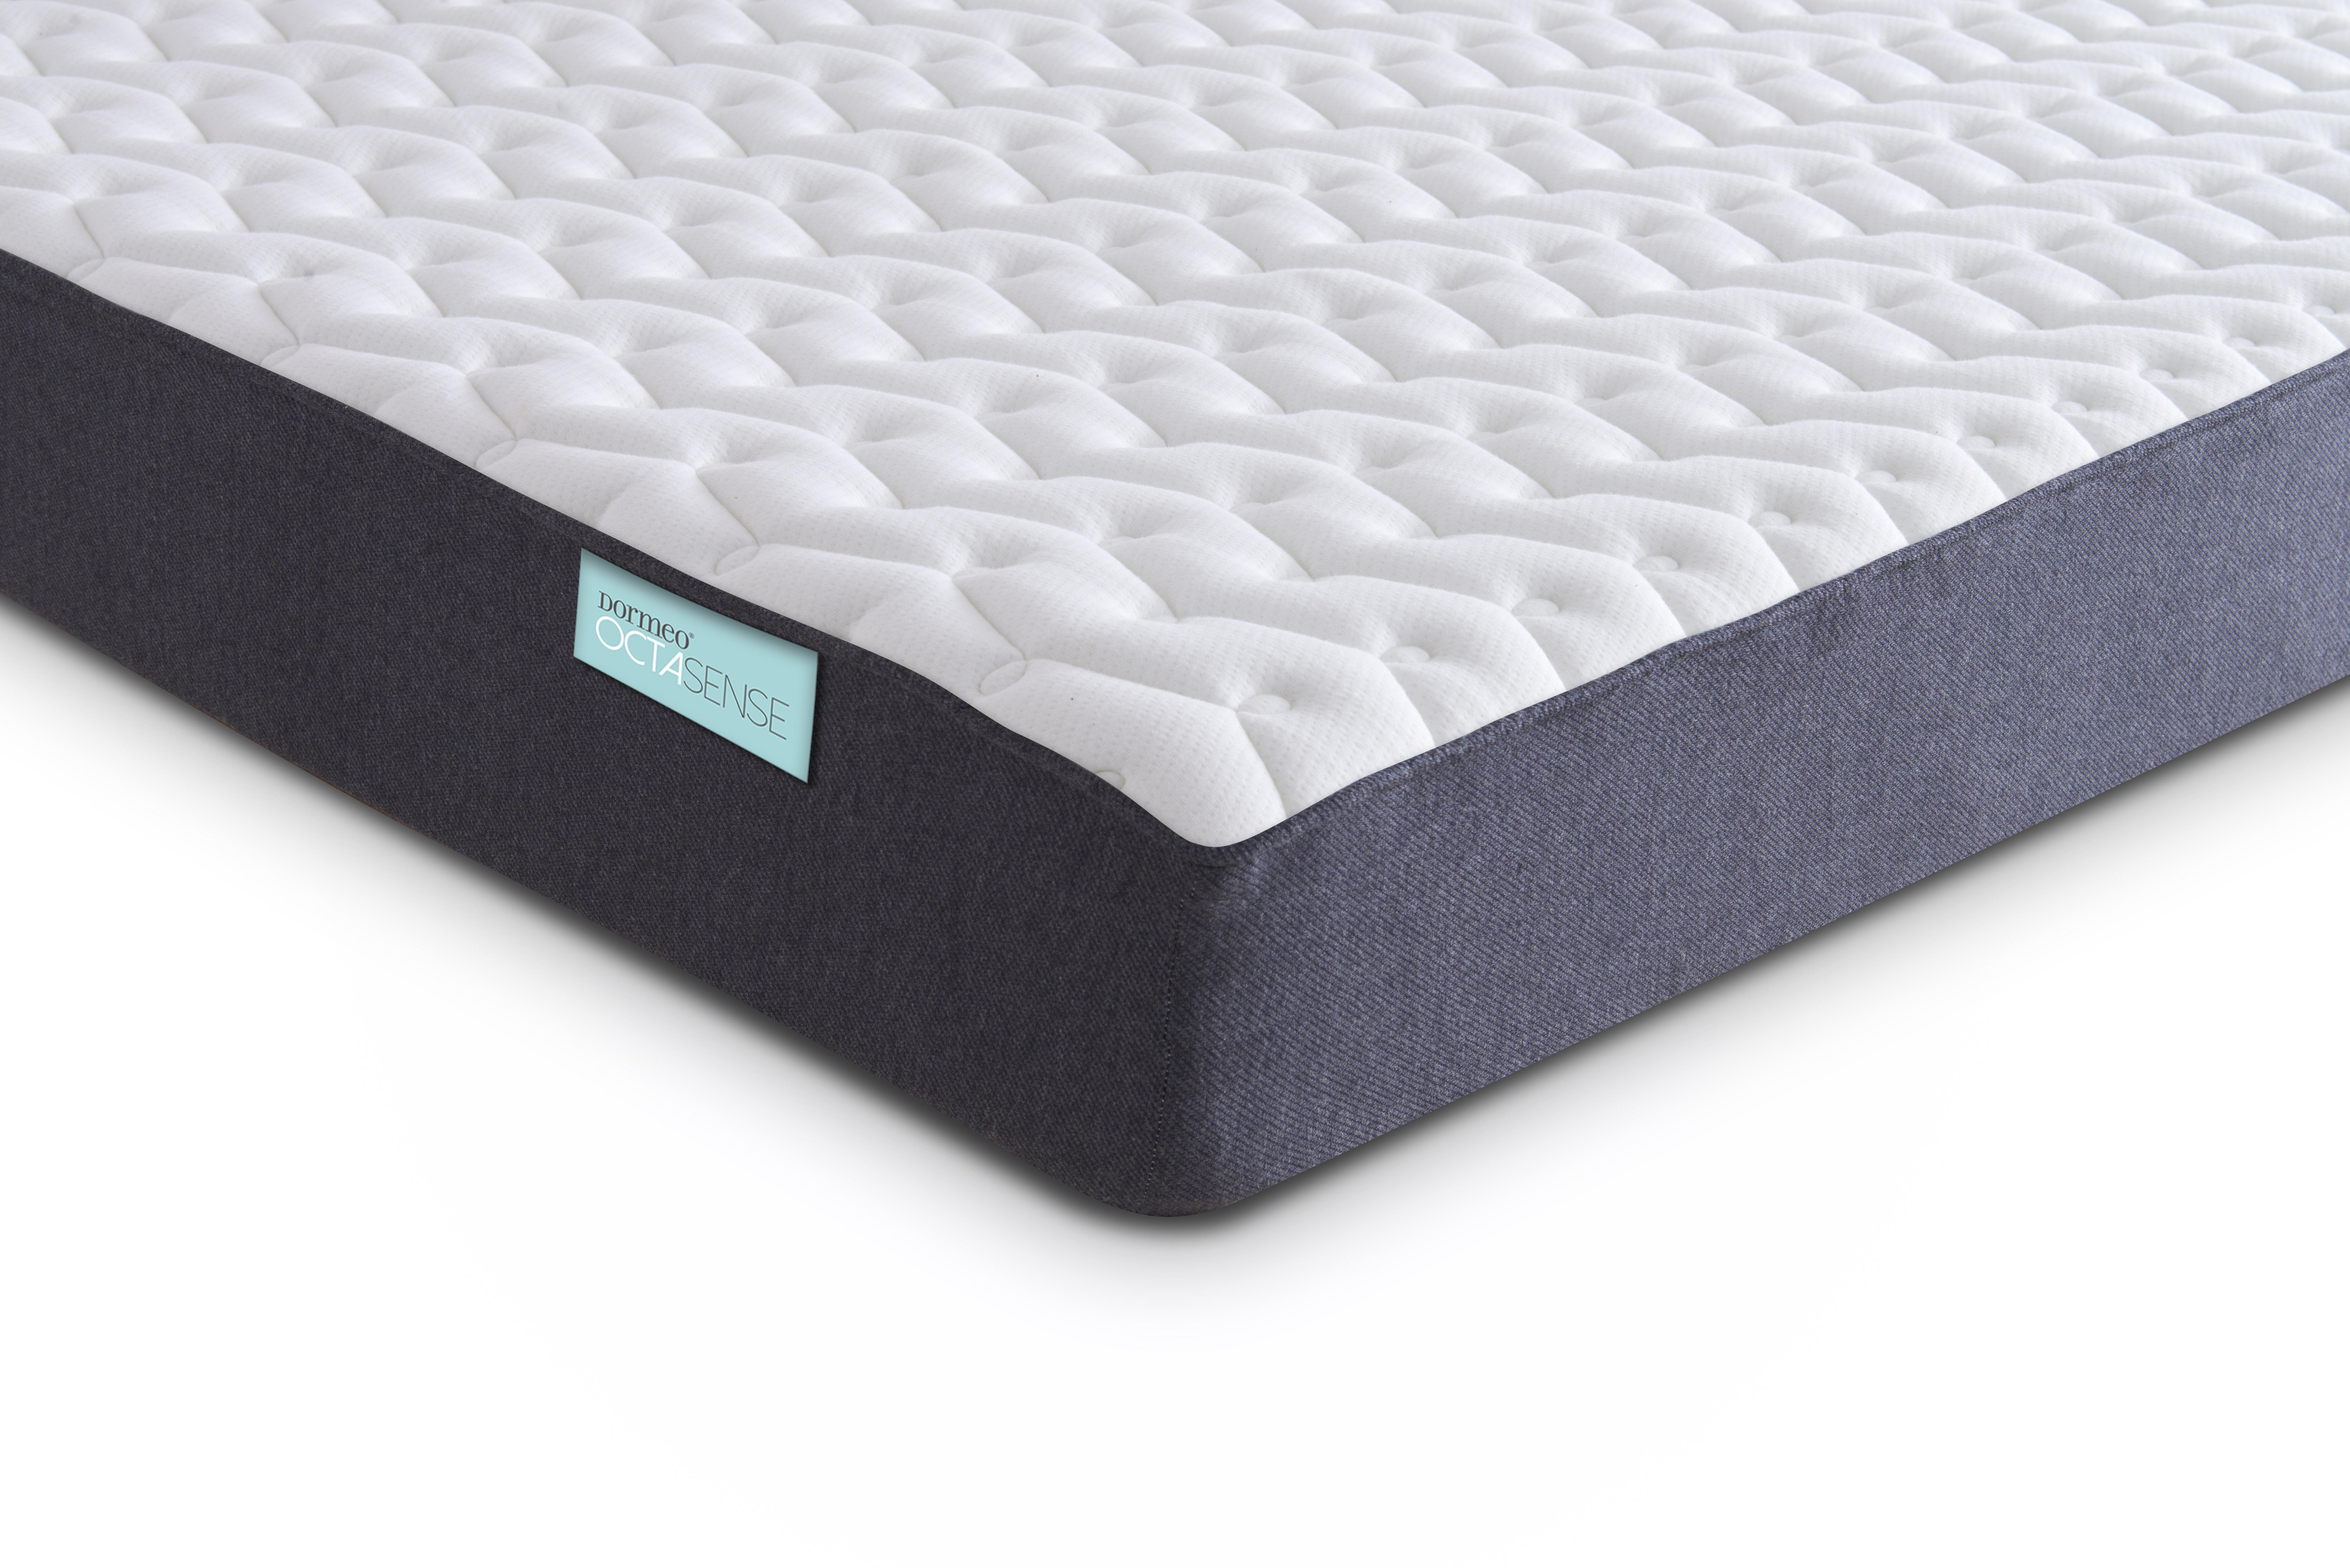 Dormeo Octaspring Matras : Buy dormeo memory octasense double mattress mattresses argos